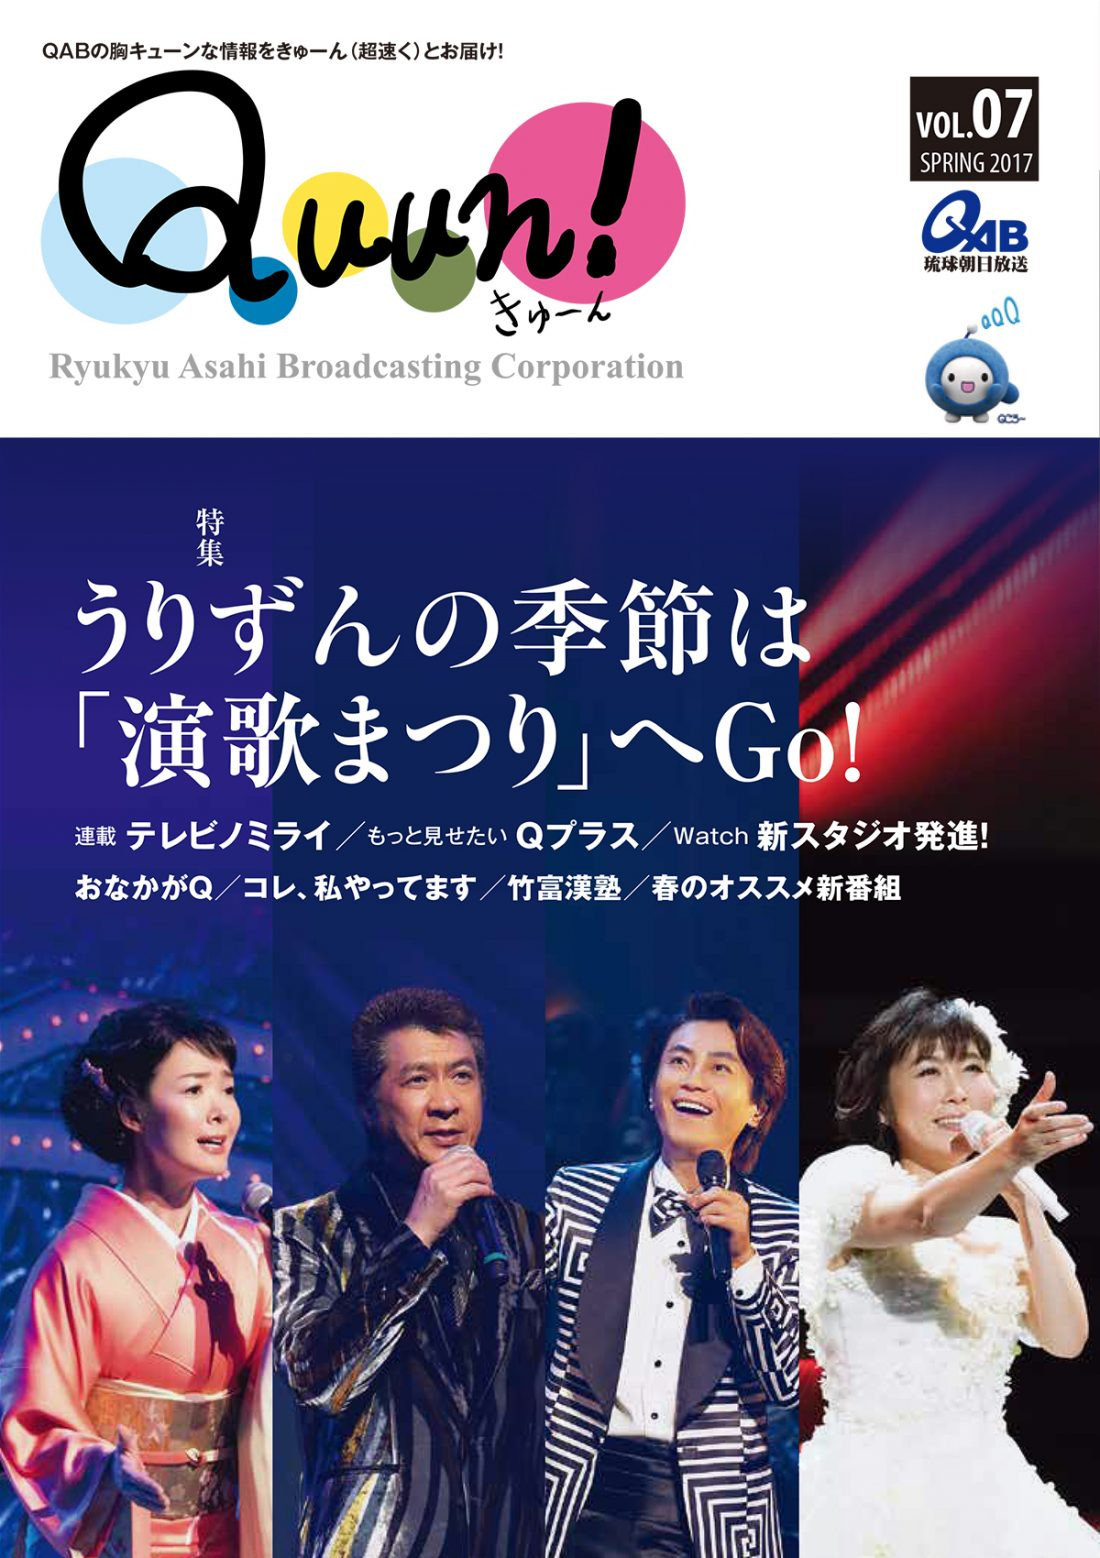 http://www.qab.co.jp/qgoro/wp-content/uploads/quun_0701-1100x1558.jpg